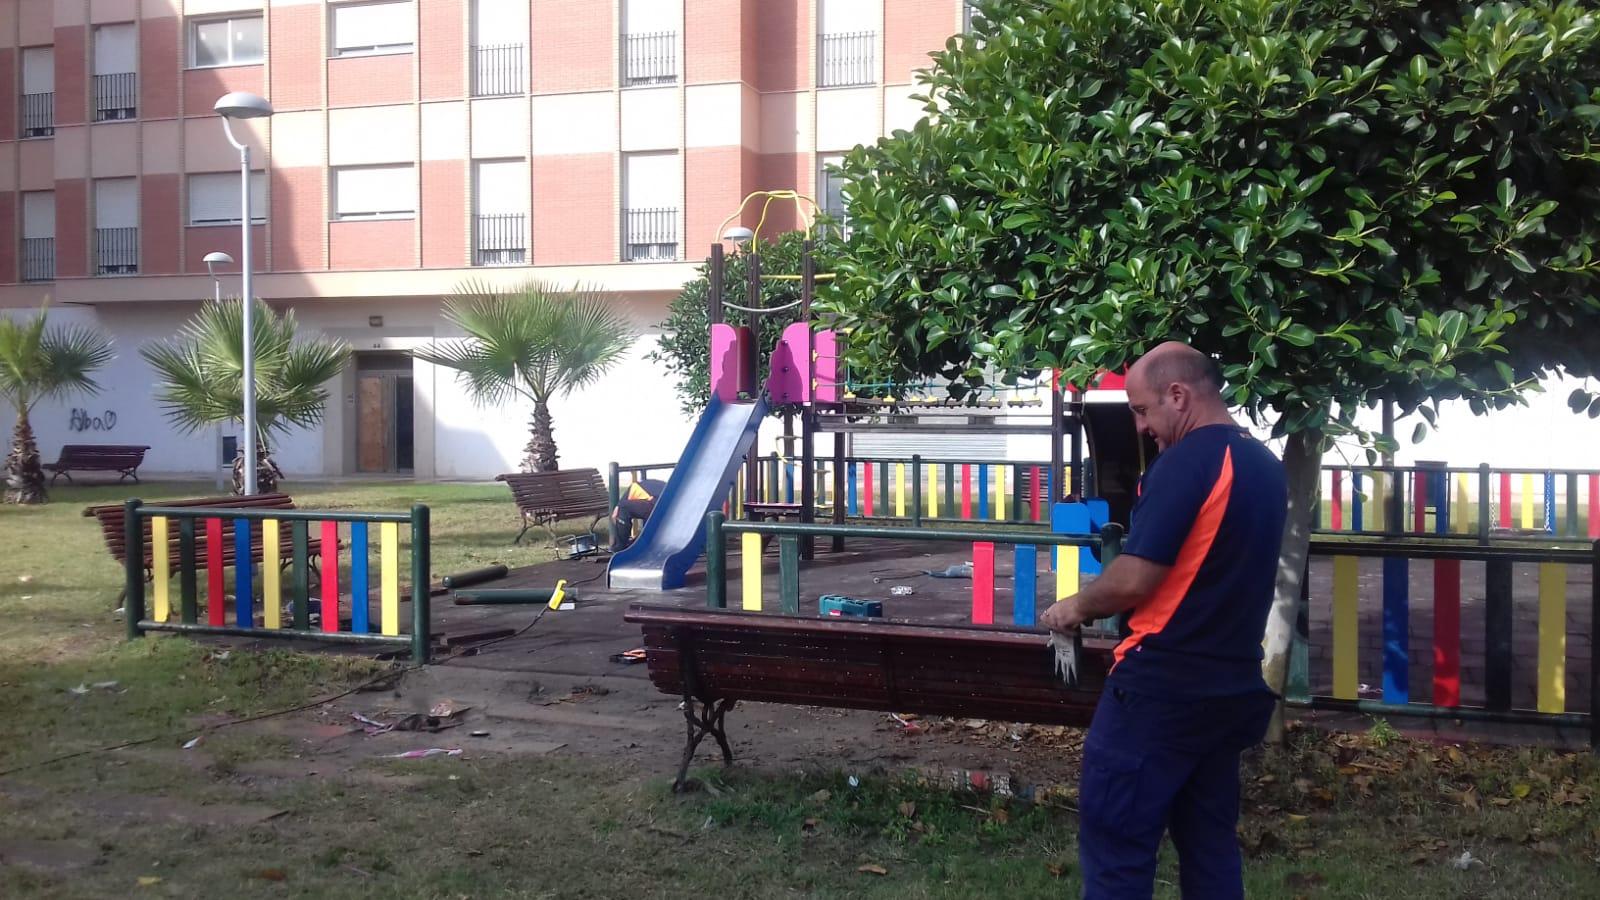 mantenimiento de parques Adra